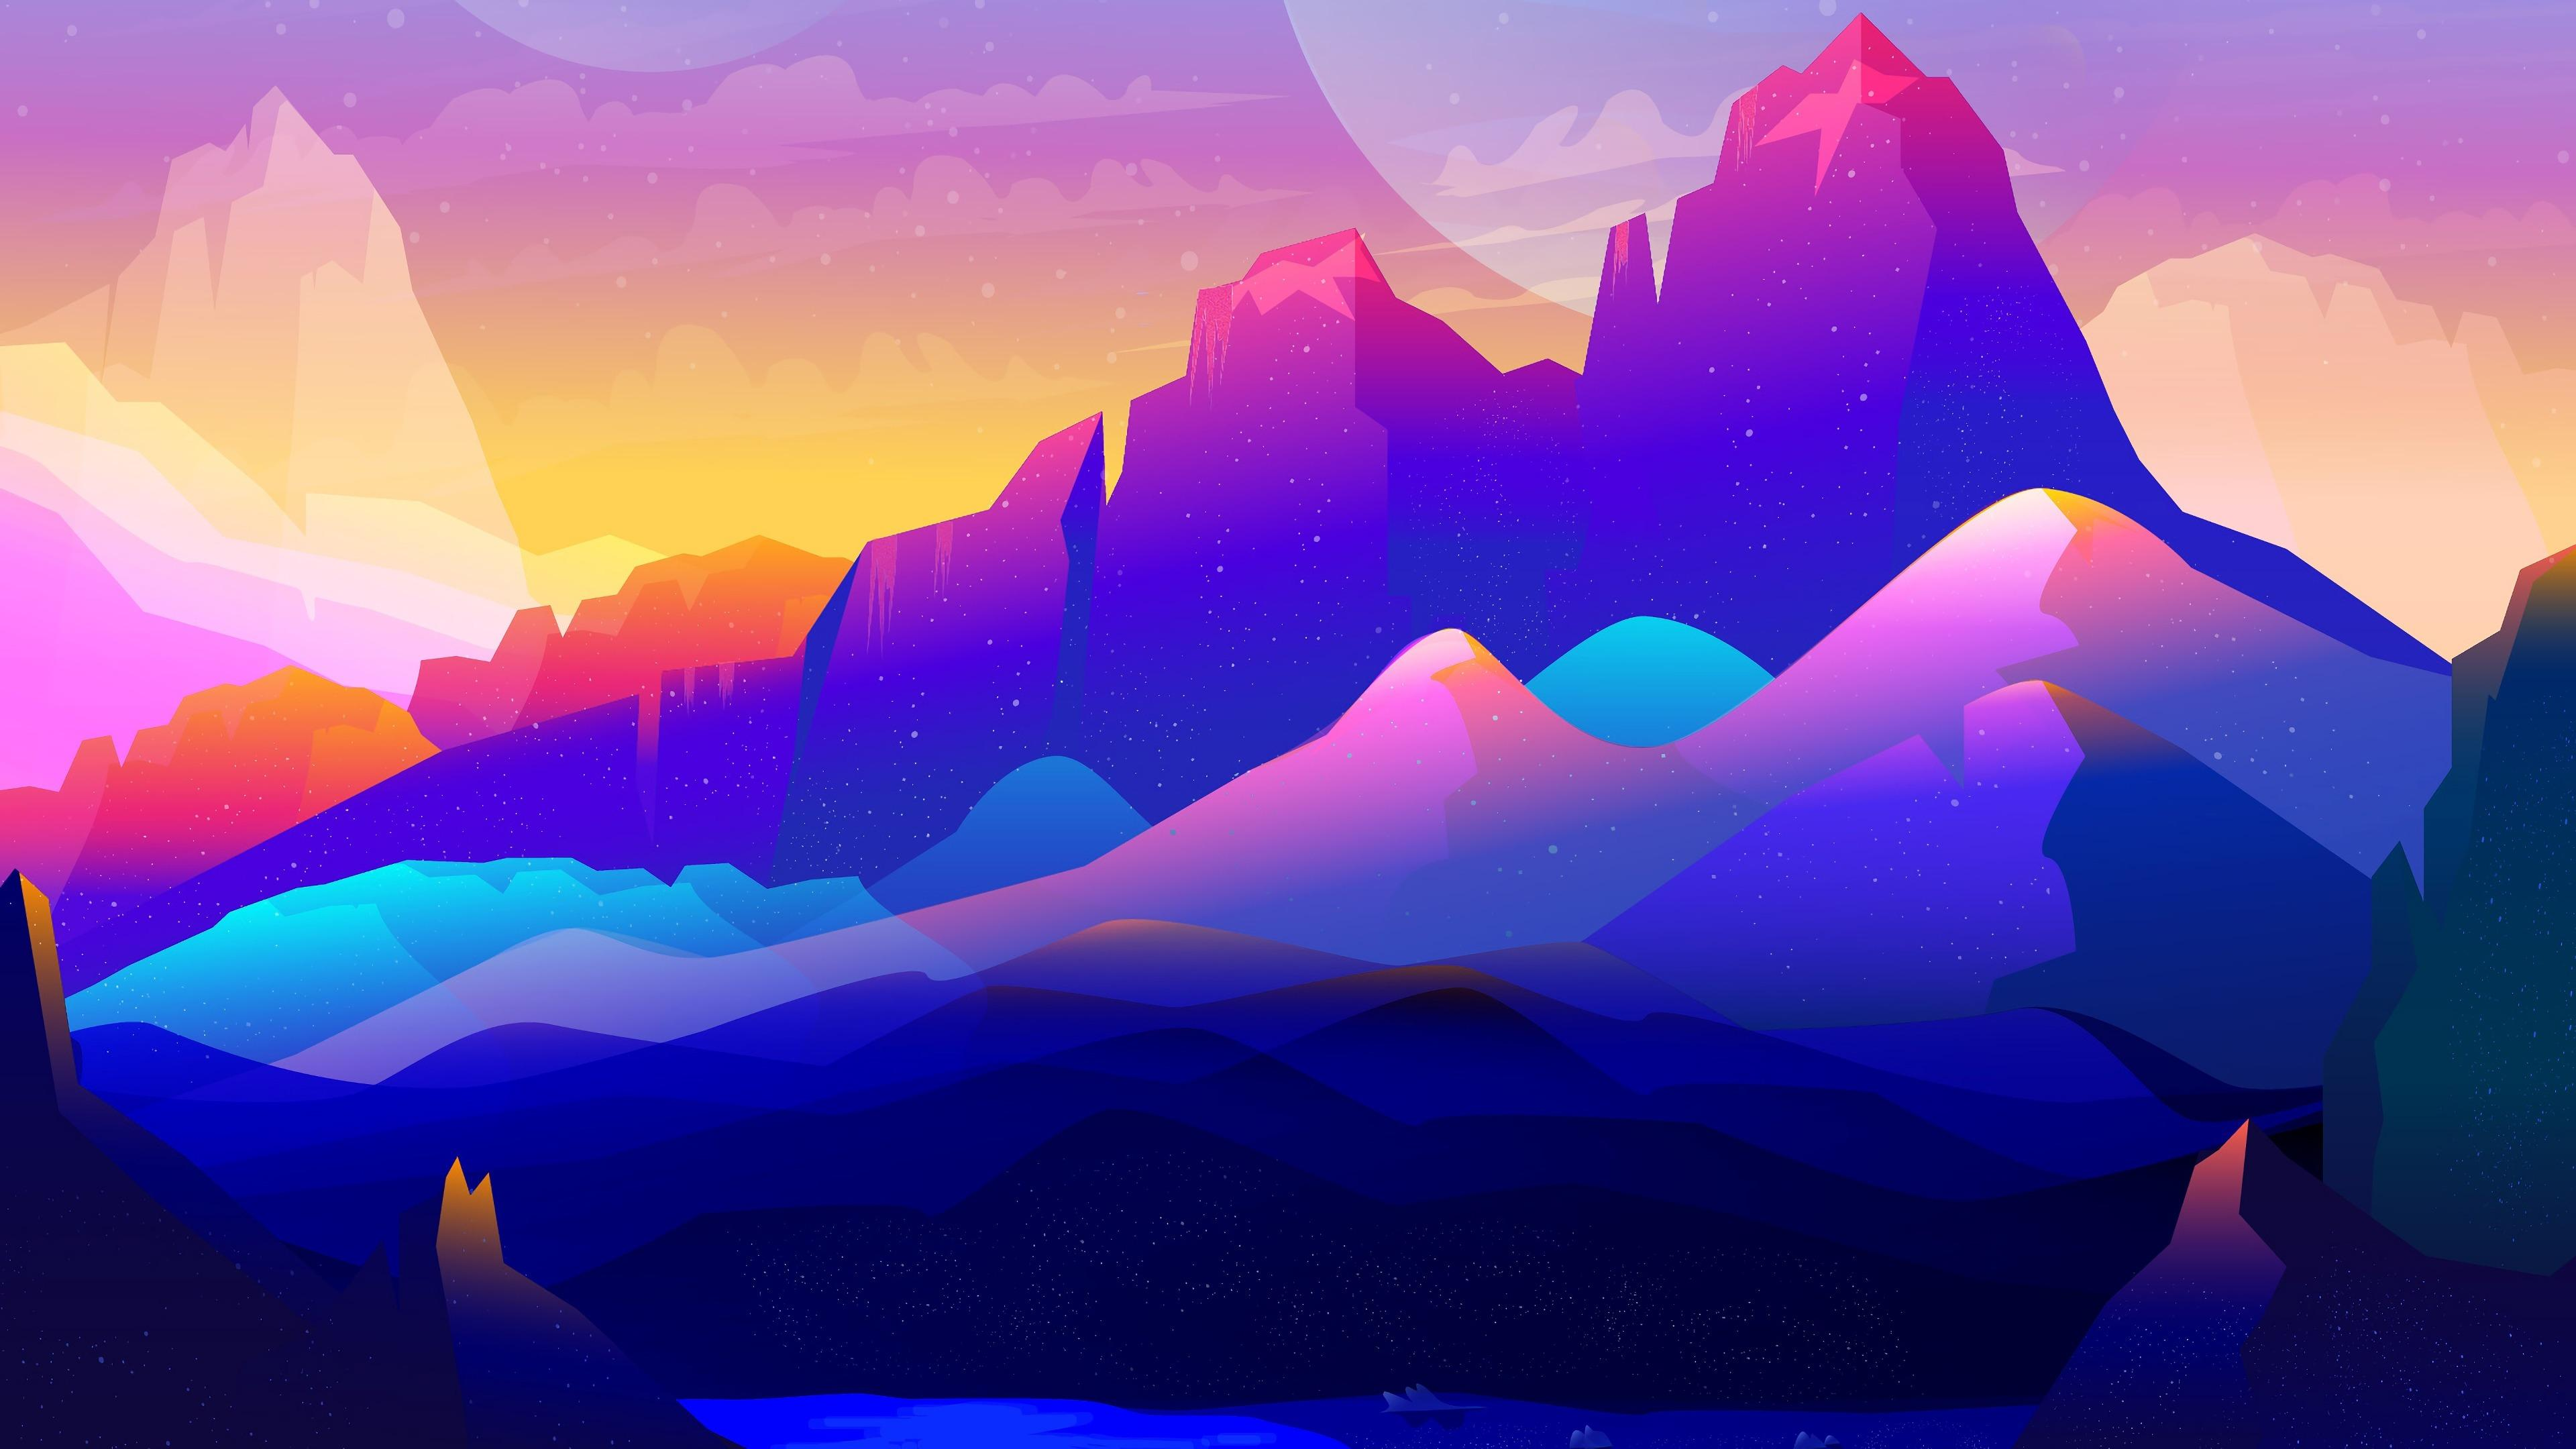 Purple mountains digital illustration wallpaper